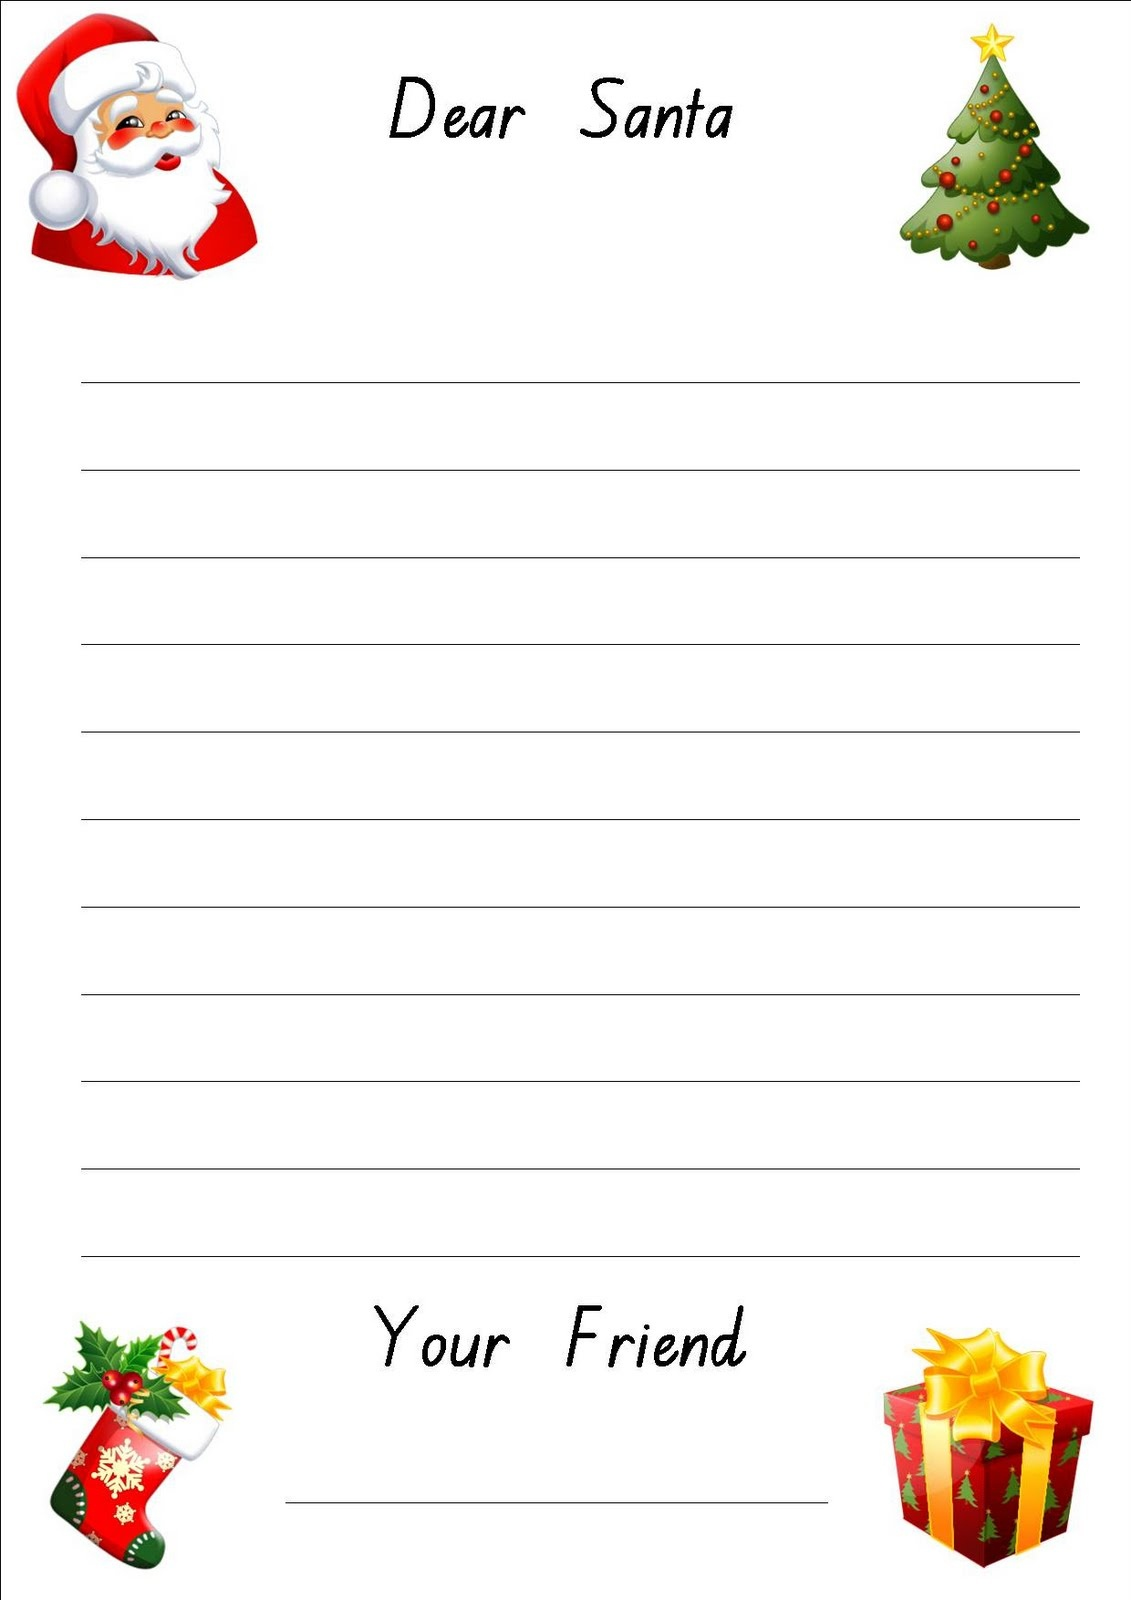 Free Printable: Letter To Santa Paper - Free Printable Santa Letter Paper